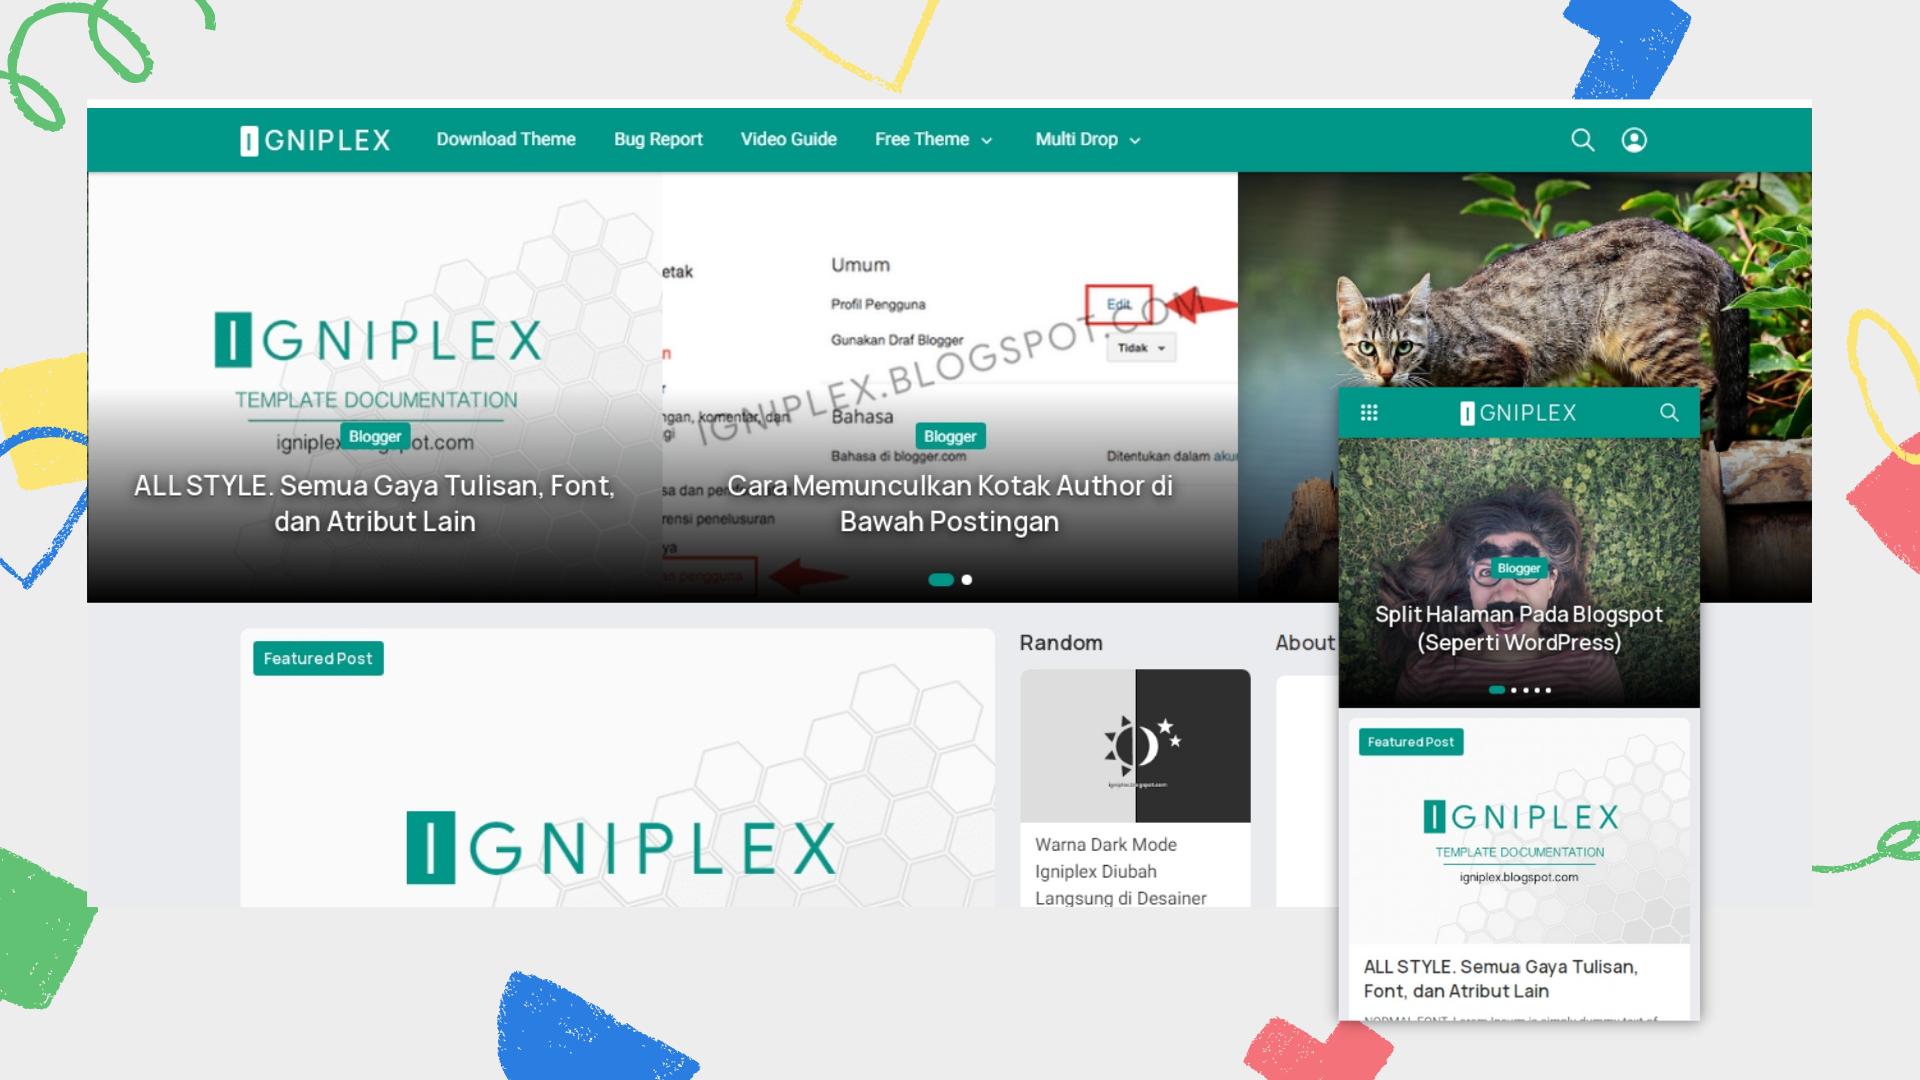 igniplex-v26-premium-blogger-template